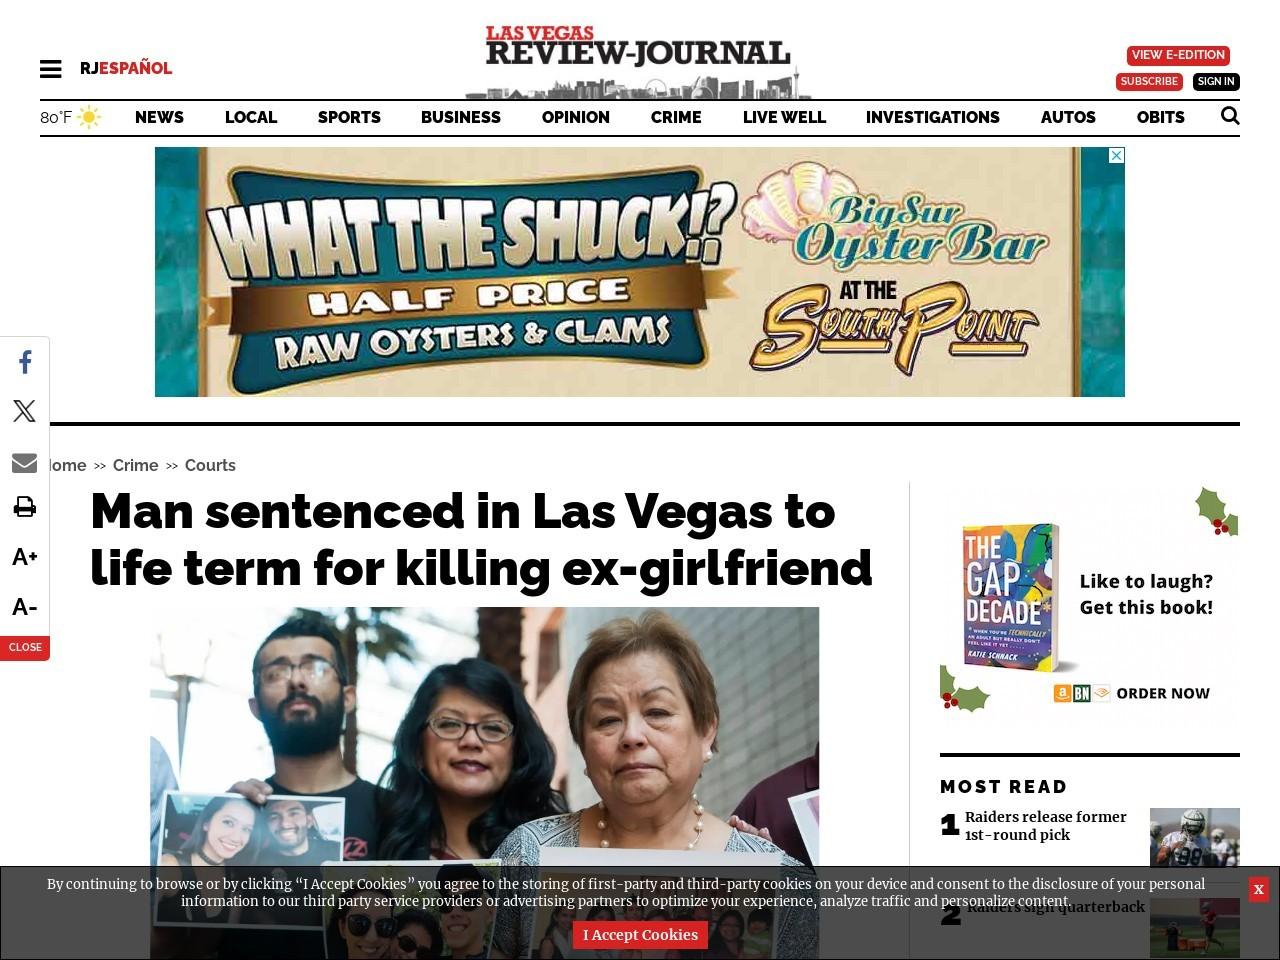 Man sentenced in Las Vegas to life term for killing ex-girlfriend